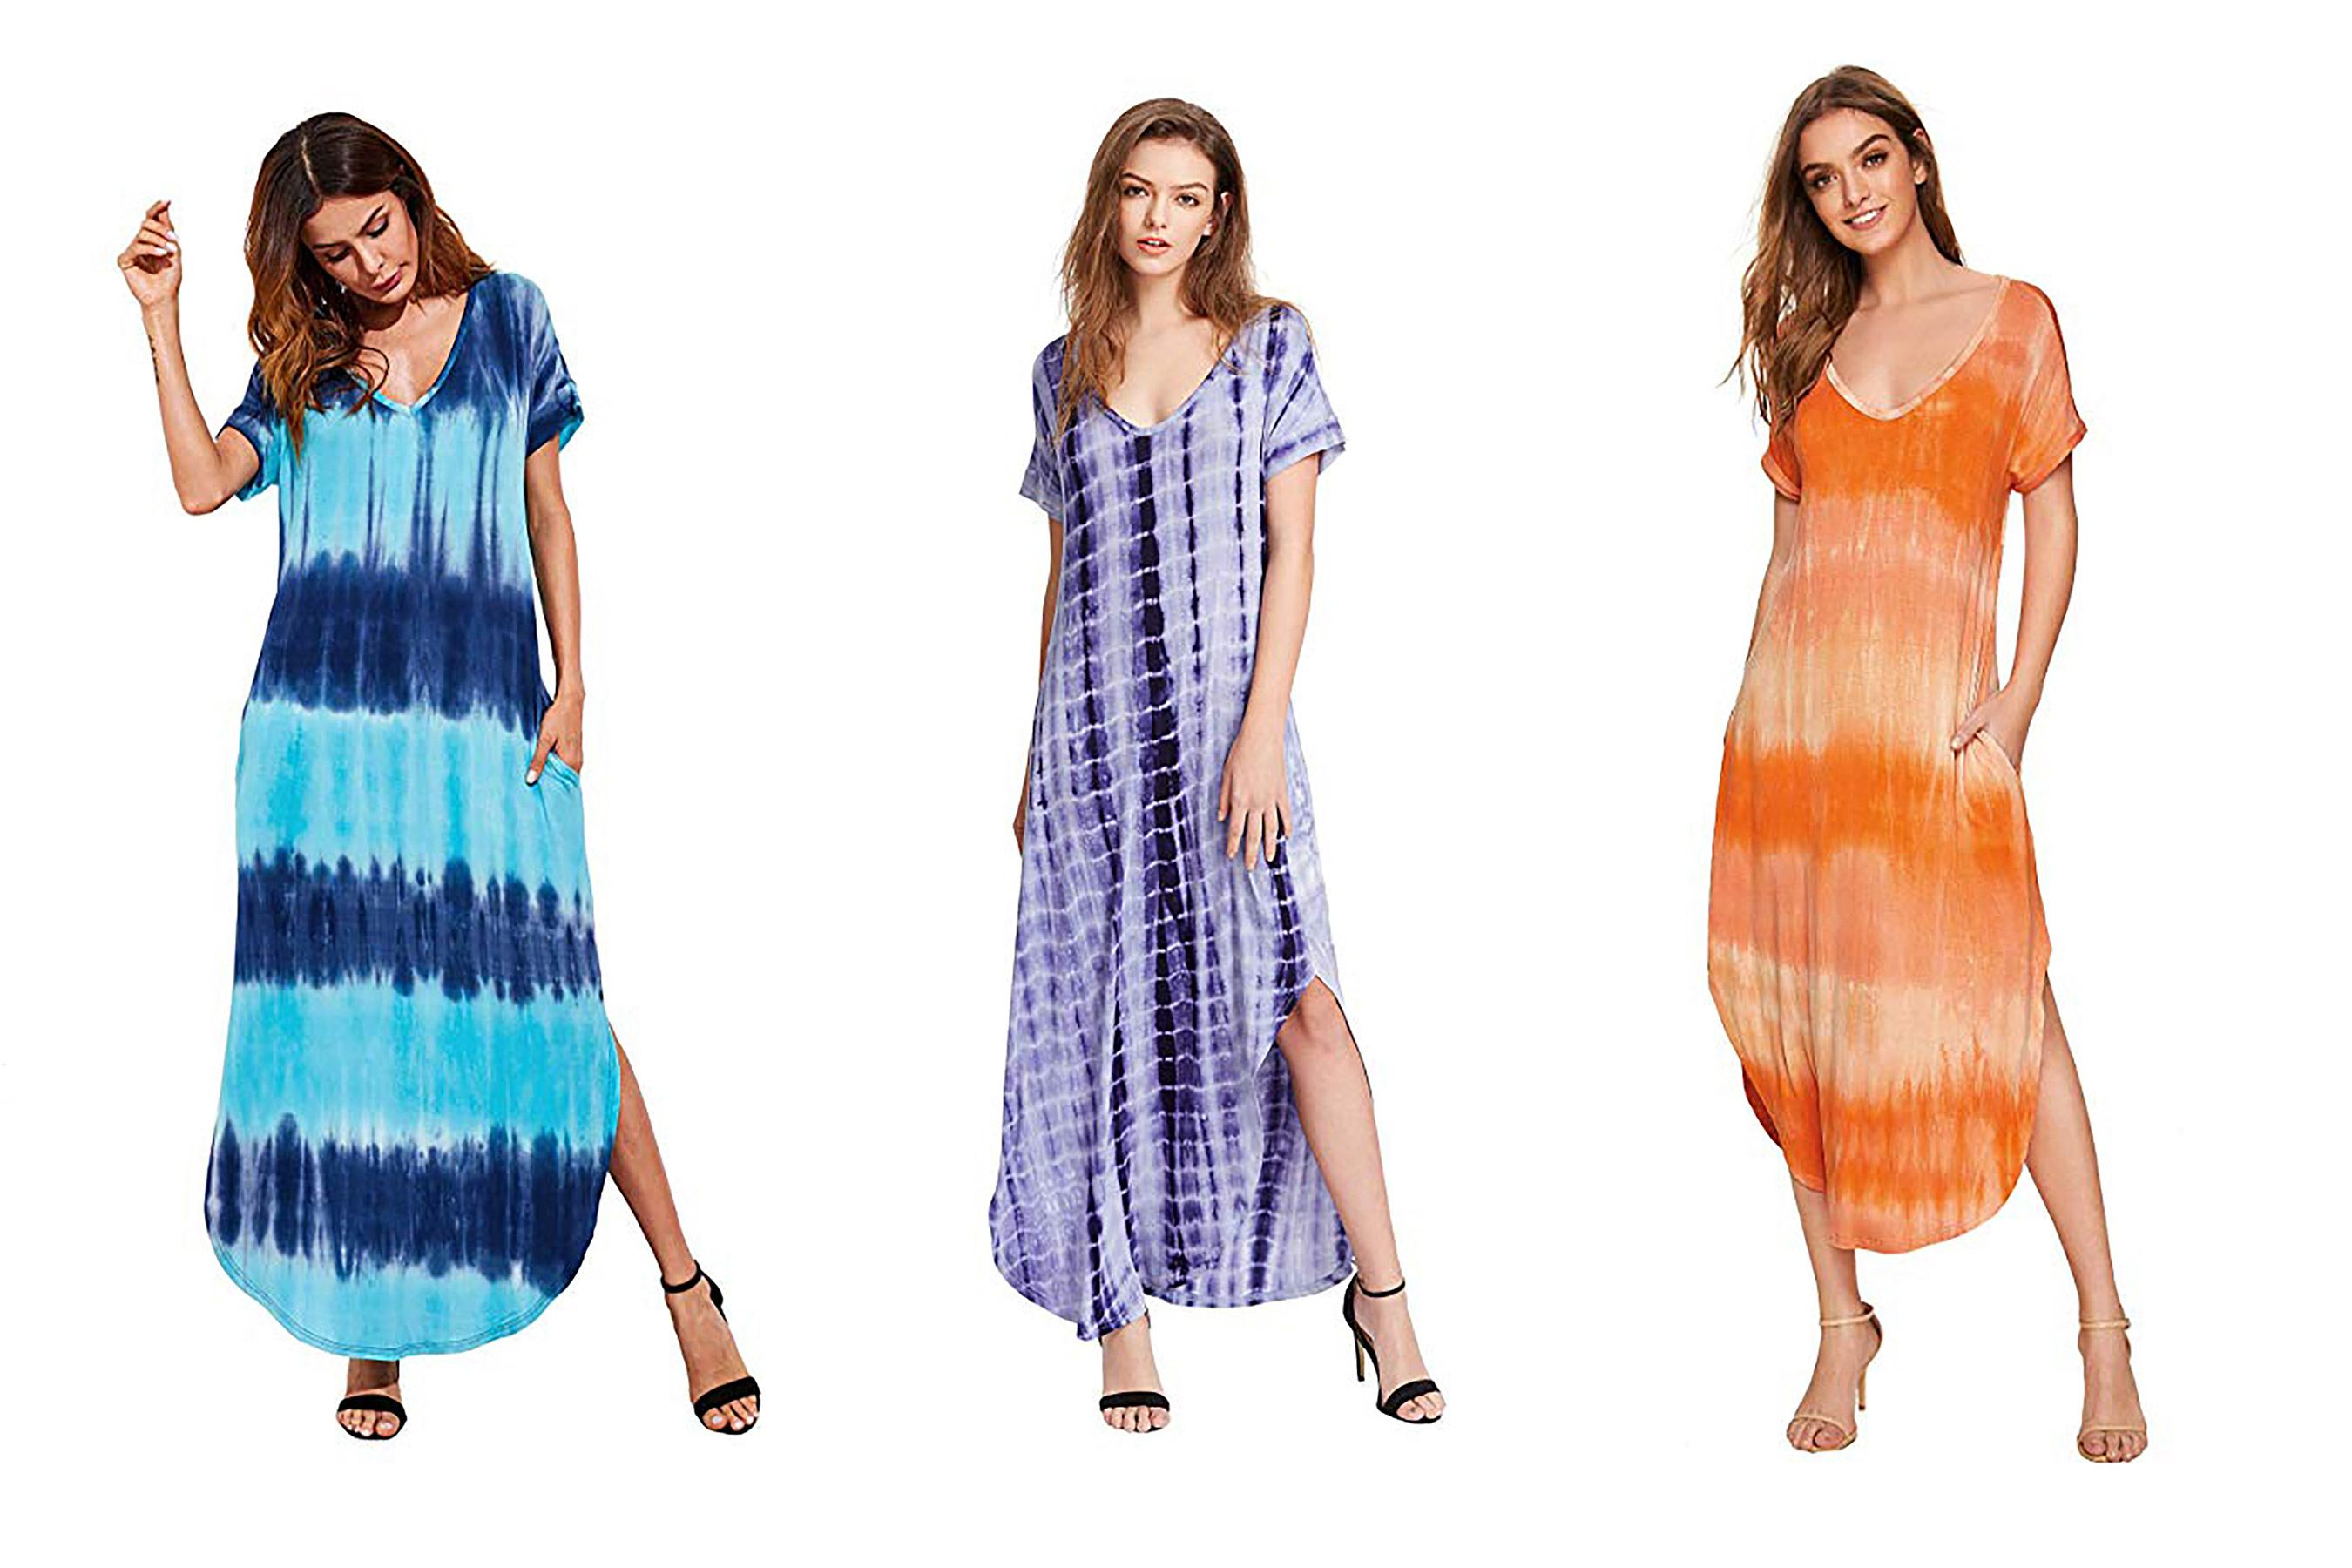 Ella Tie Dye Bodycon Tube Dress